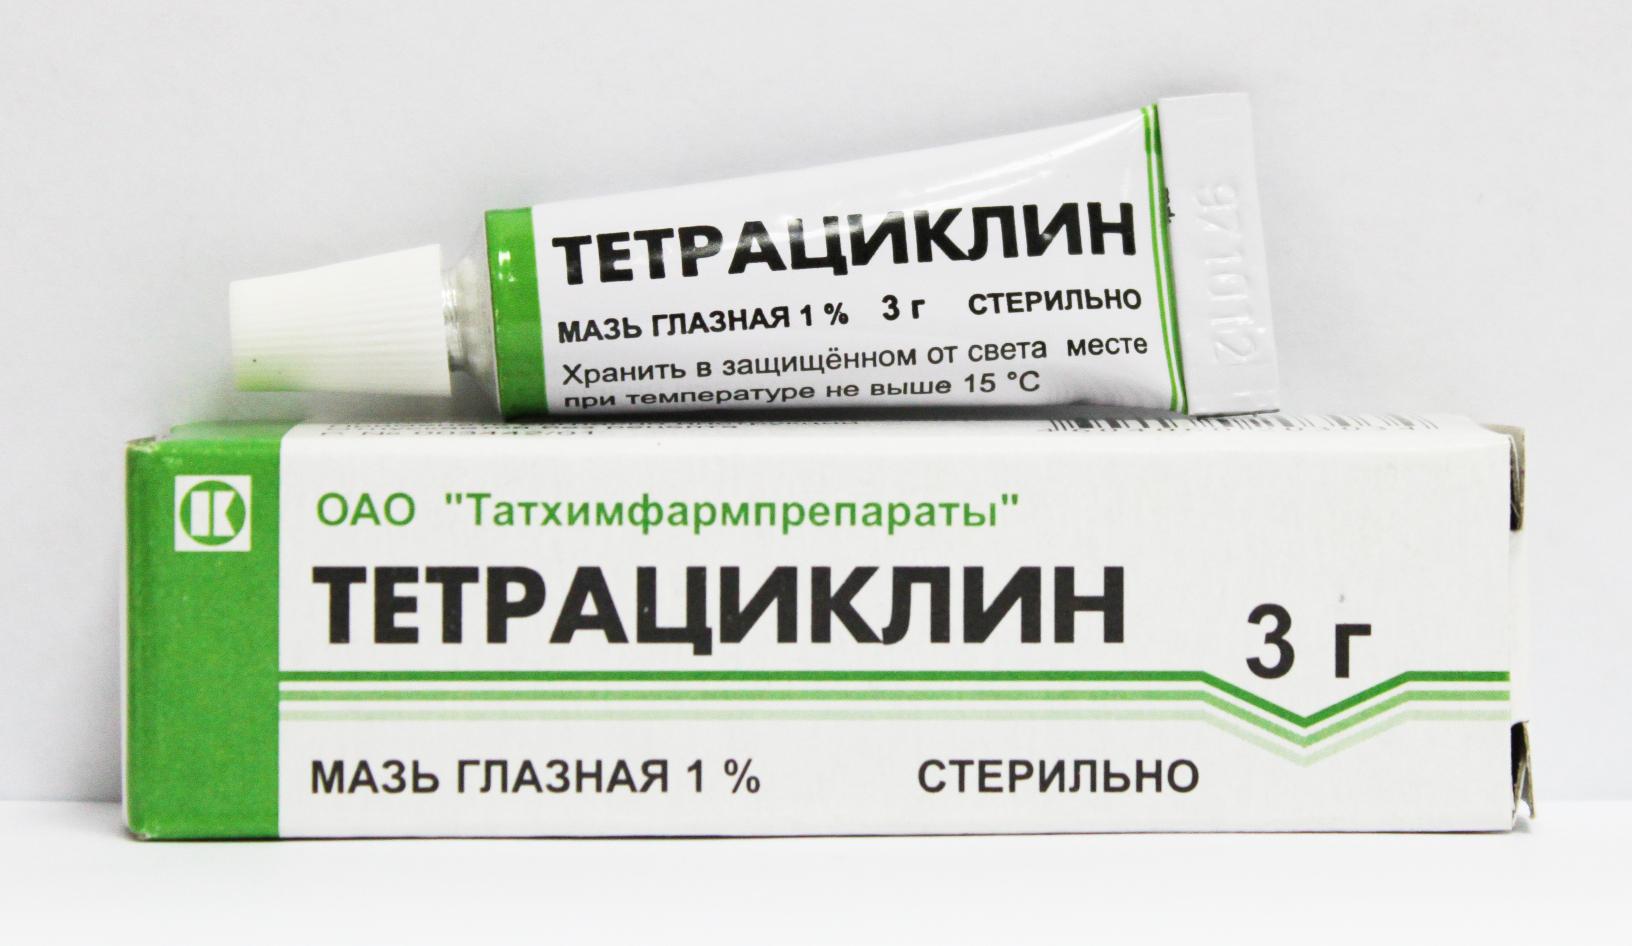 Тетрациклин против герпеса